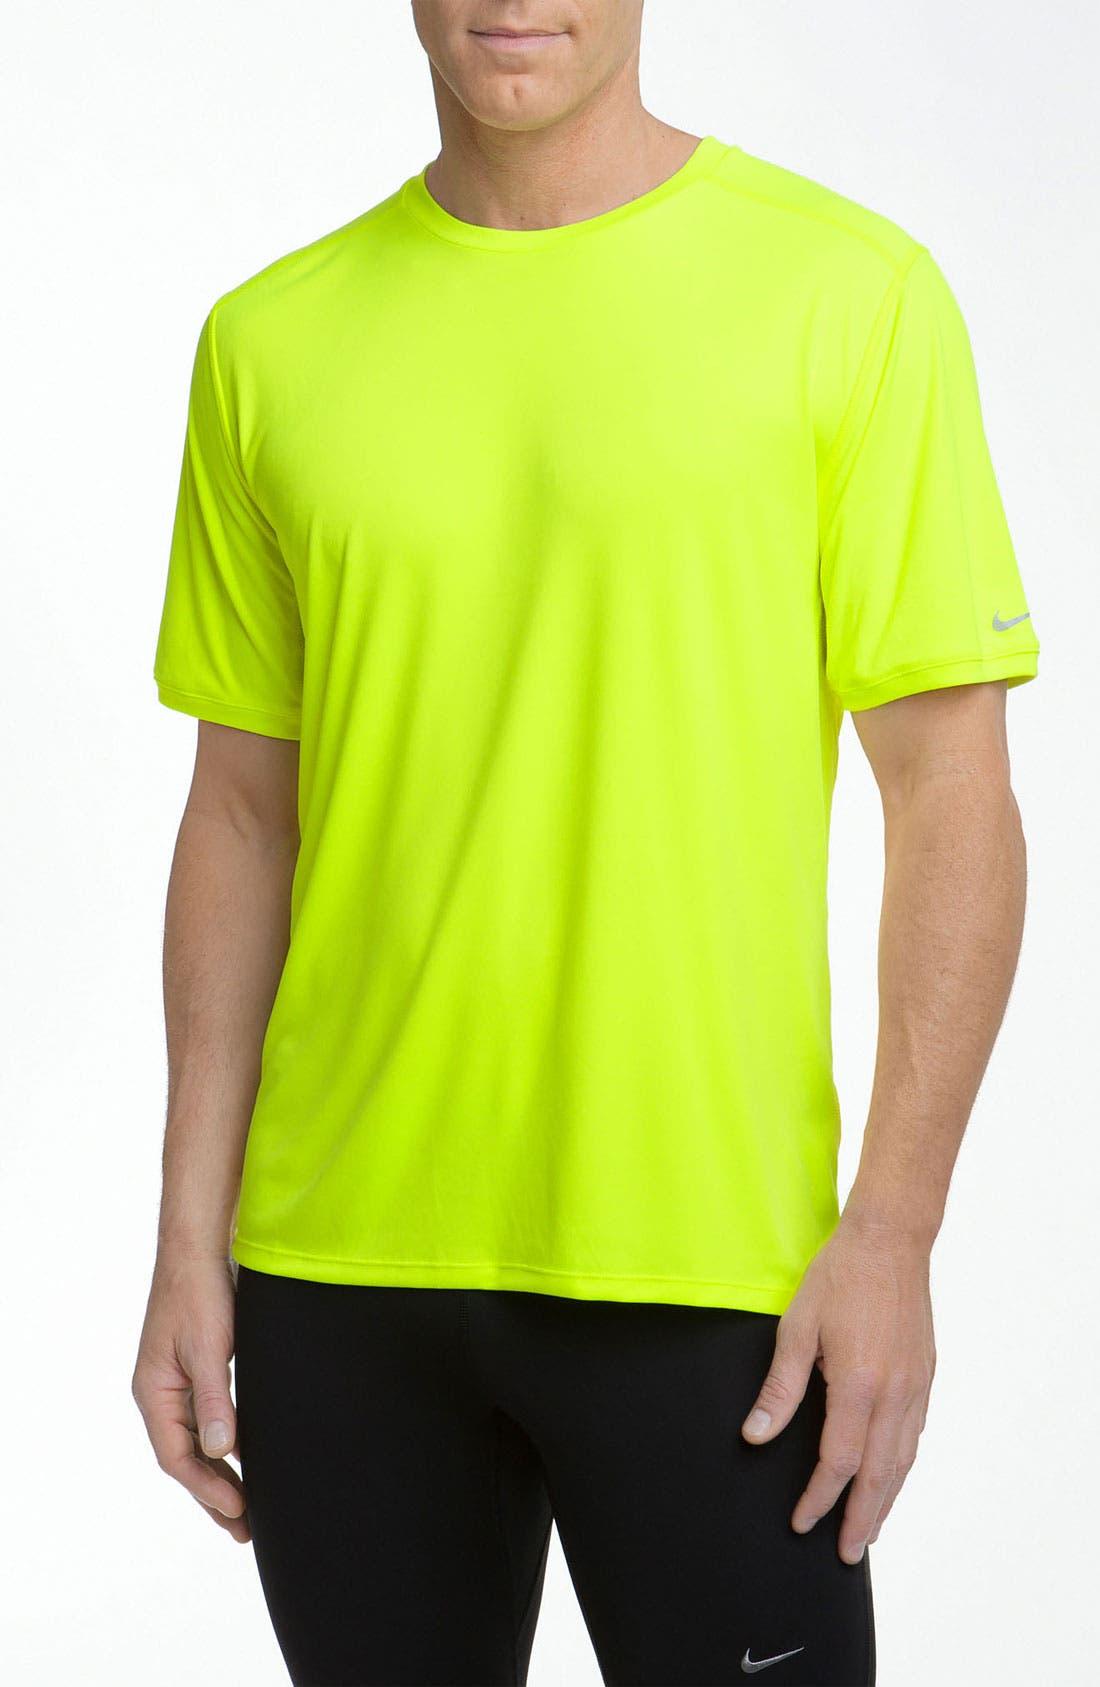 Main Image - Nike 'Relay' Dri-FIT T-Shirt